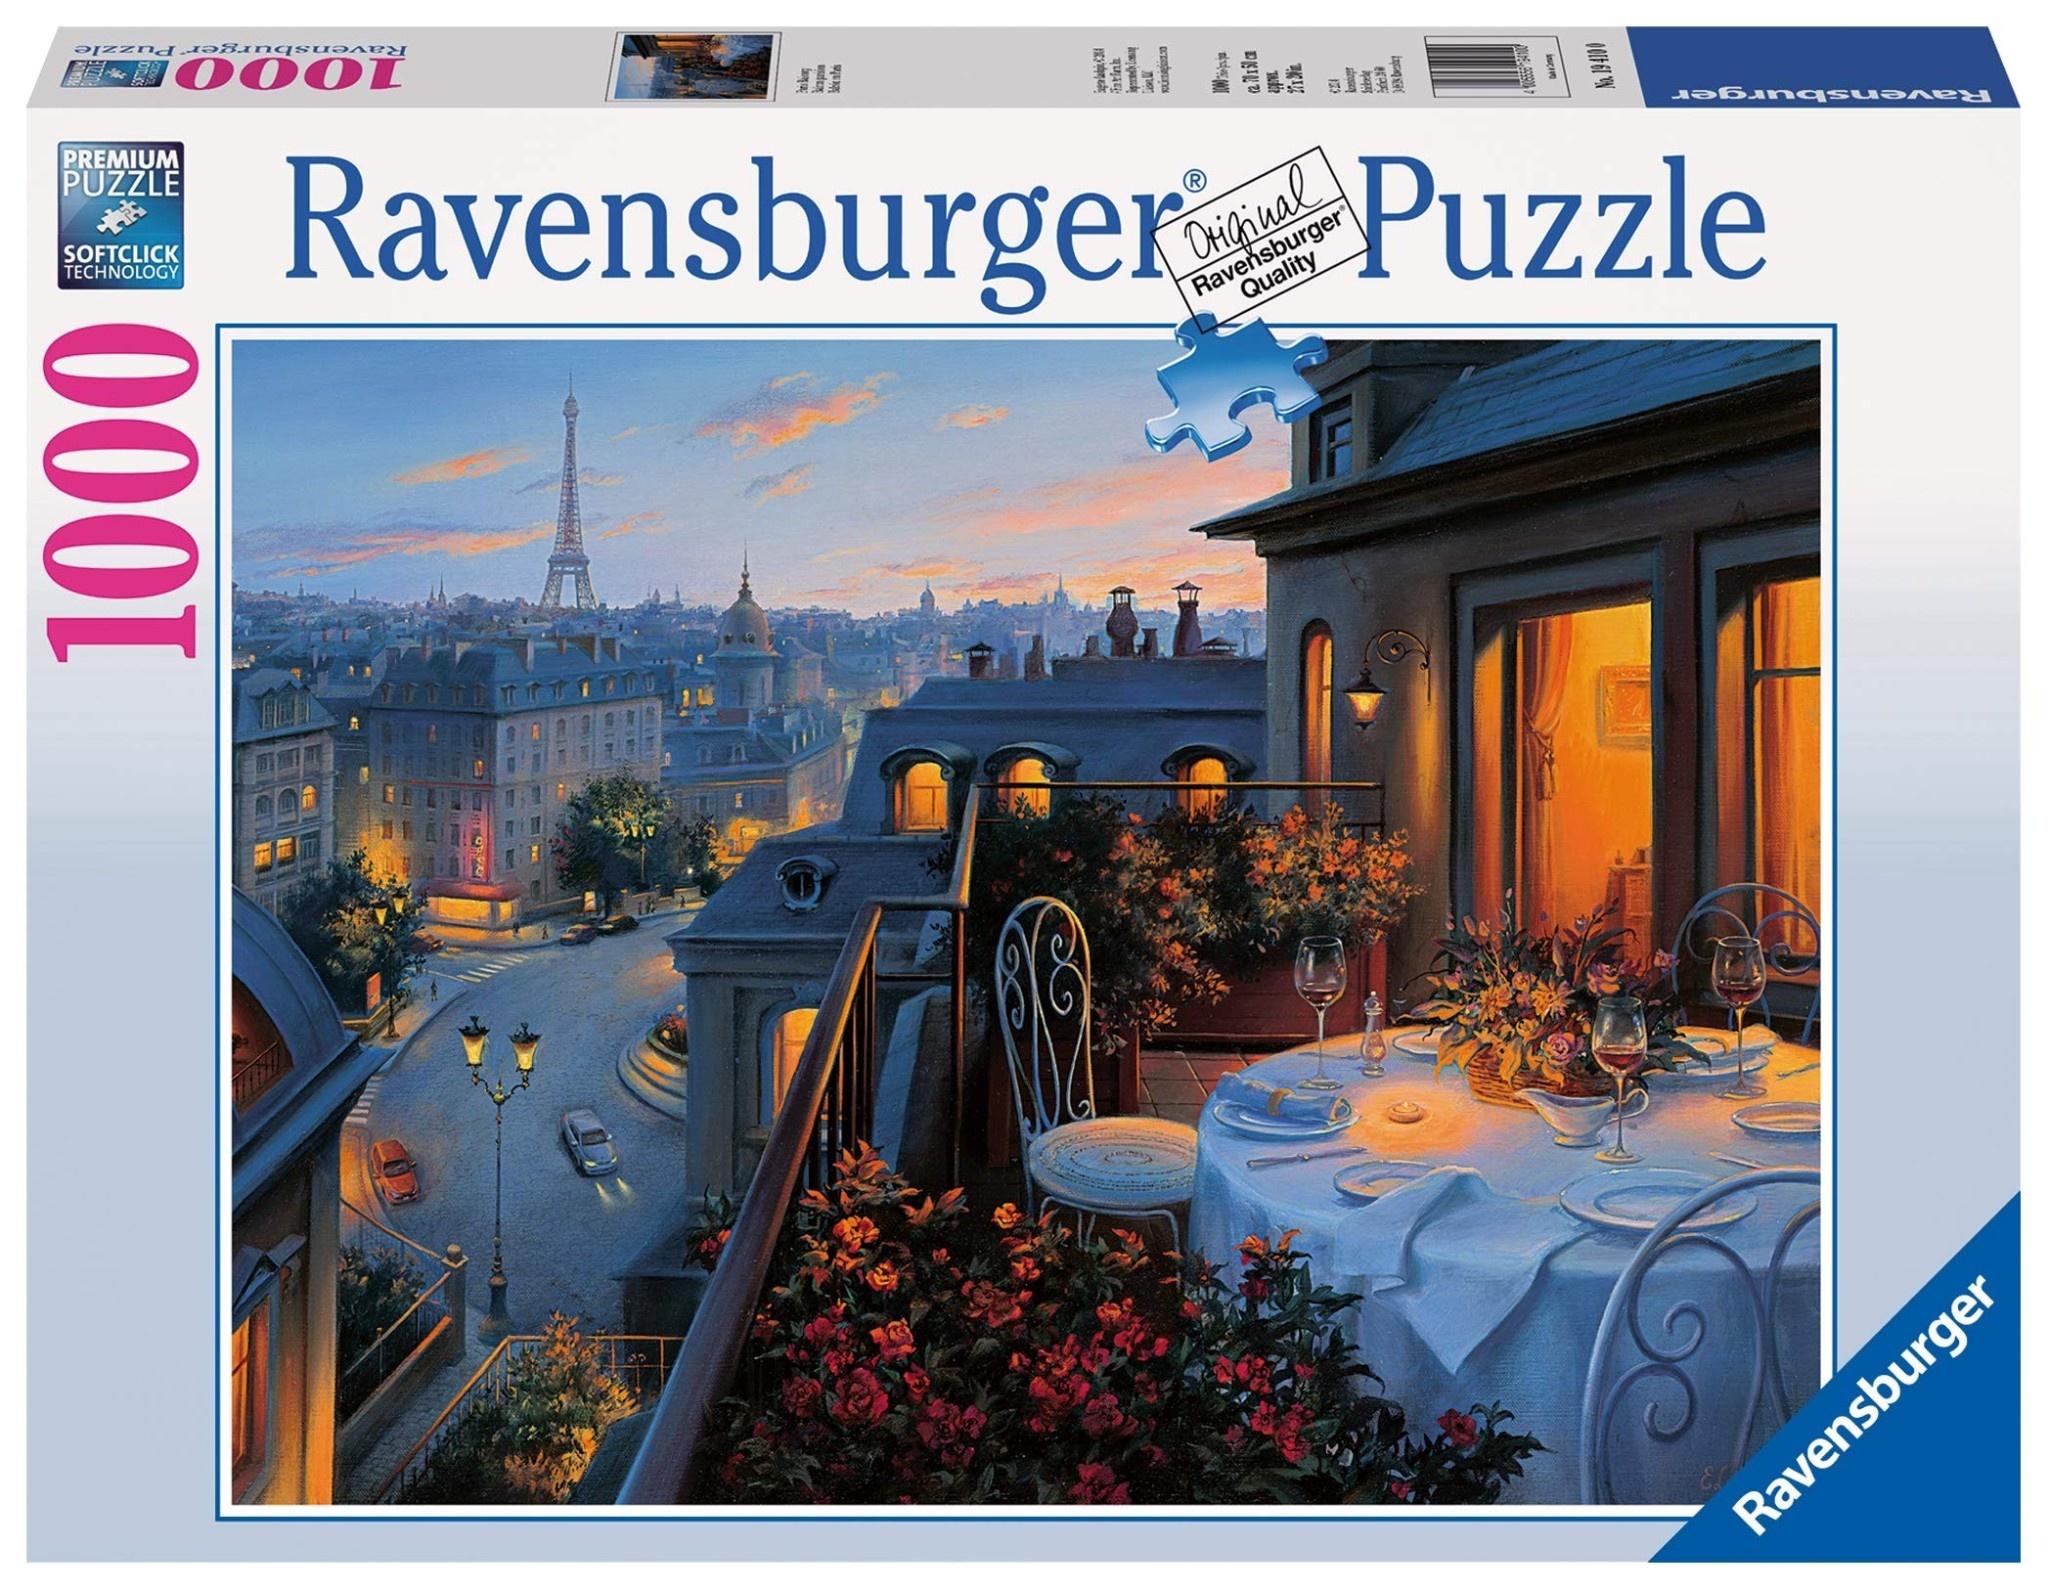 Ravensburger Ravensburger Puzzle: Paris Balcony  (1000pc)